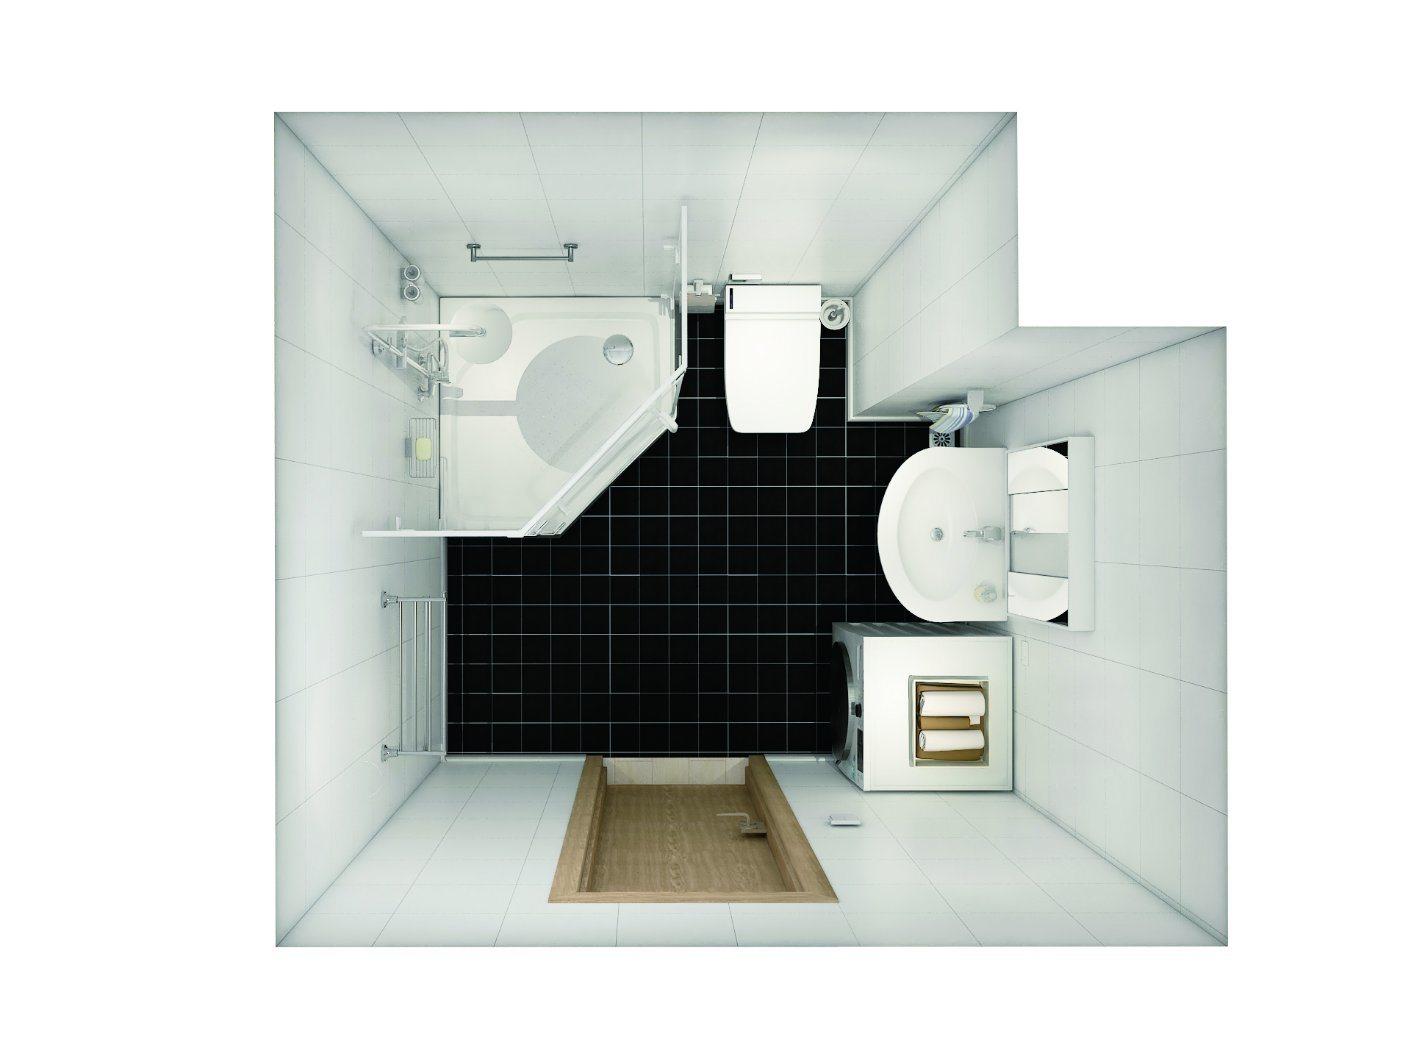 China Prefab Modular Bathroom Shower Toilet Shower Stall Cabin with ...